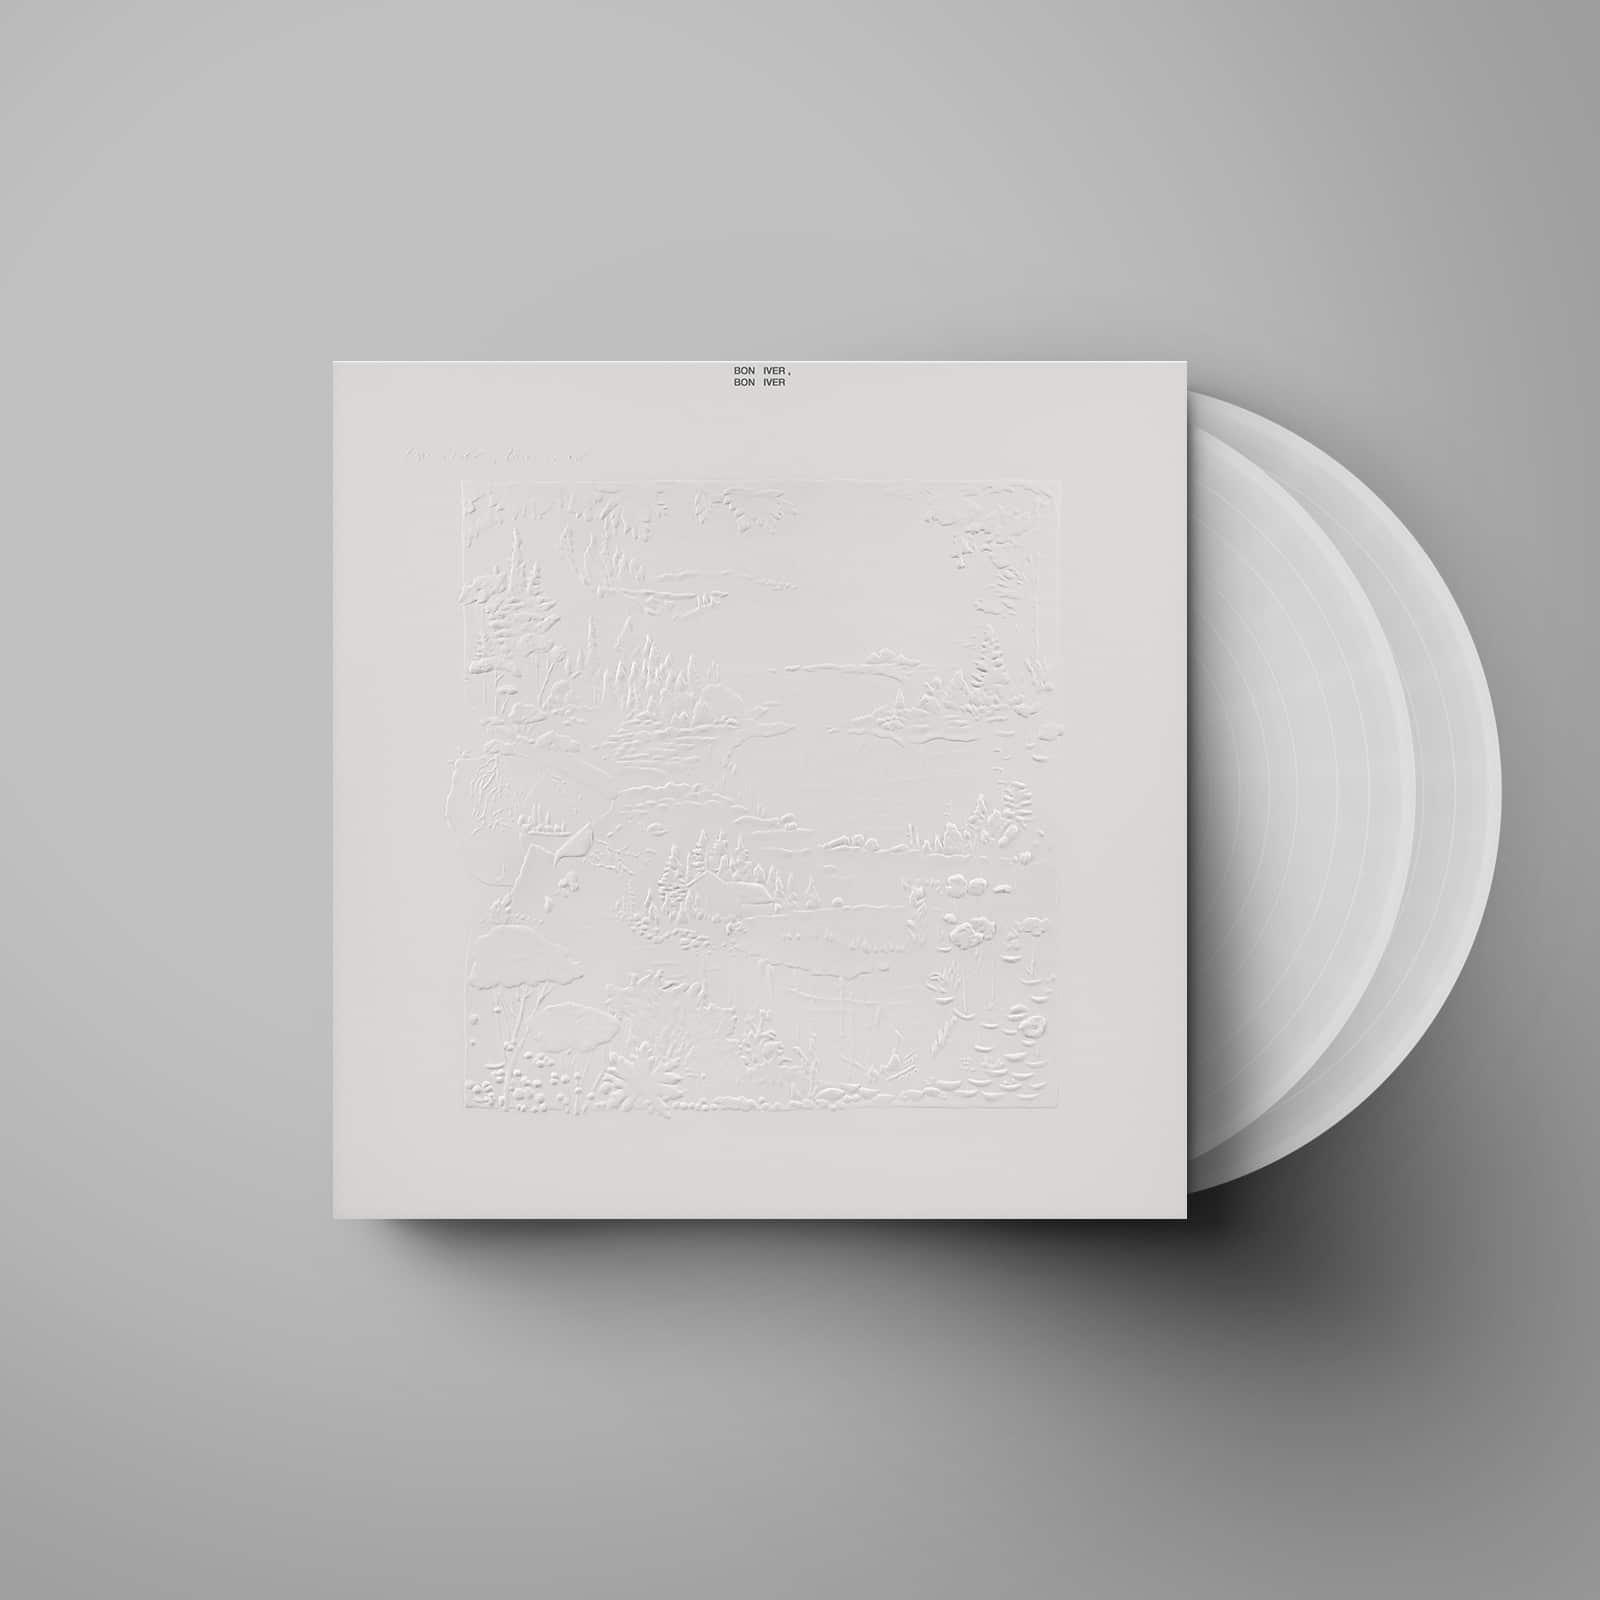 Bon Iver - Bon Iver (10th Anniversary Edition)